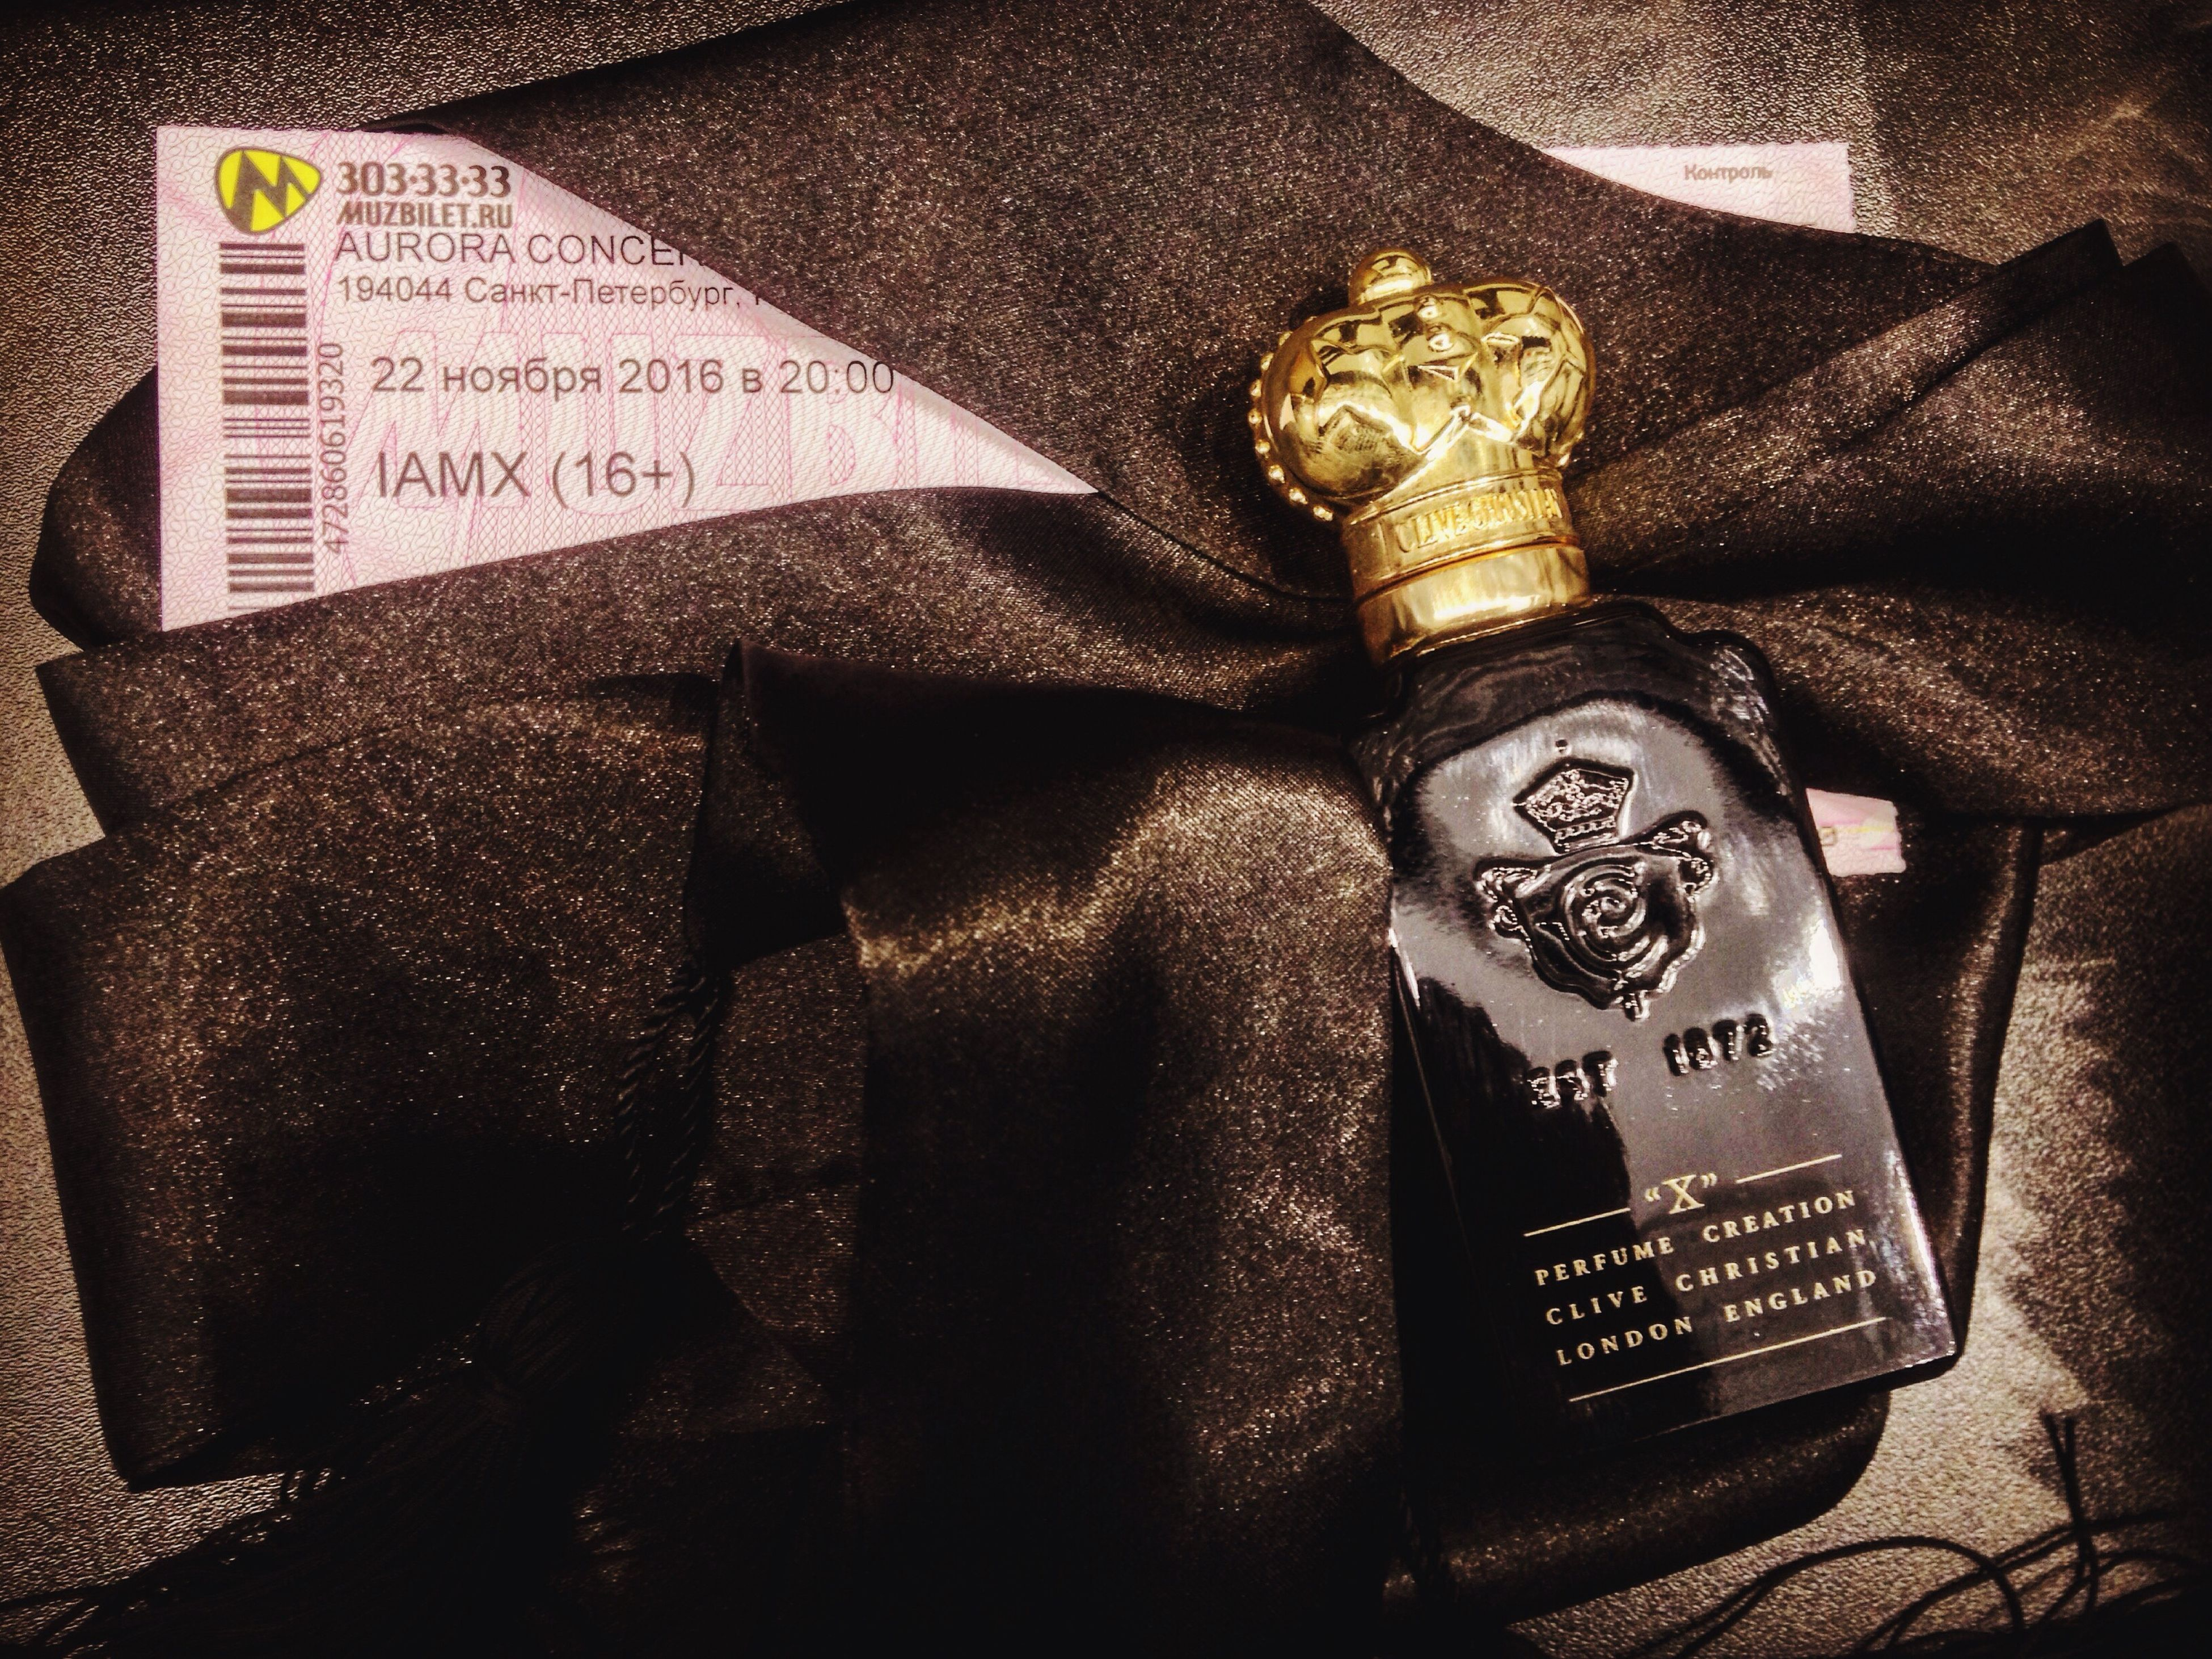 Iamx clivechristian perfume art love